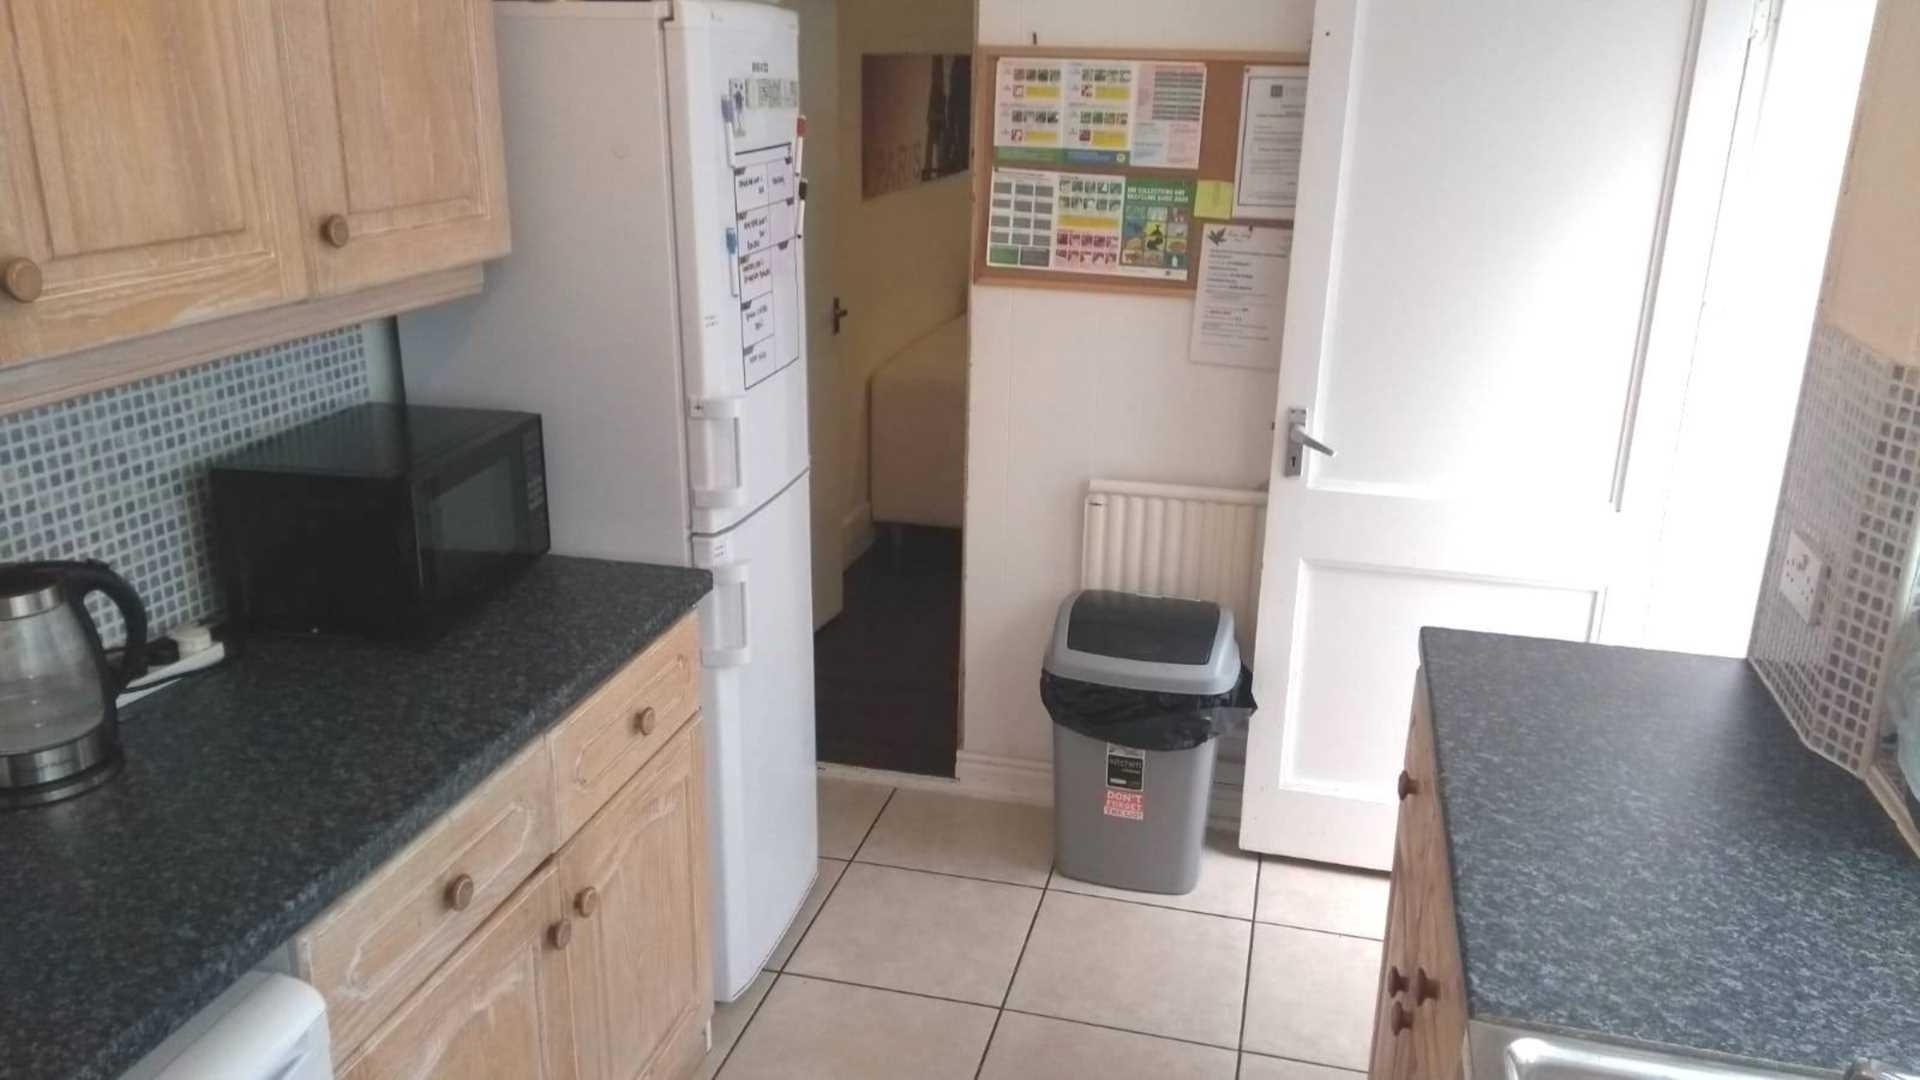 Room 3, 18 RUPERT ROAD, Guildford, GU2 7NE- NO ADMIN FEES!, Image 14